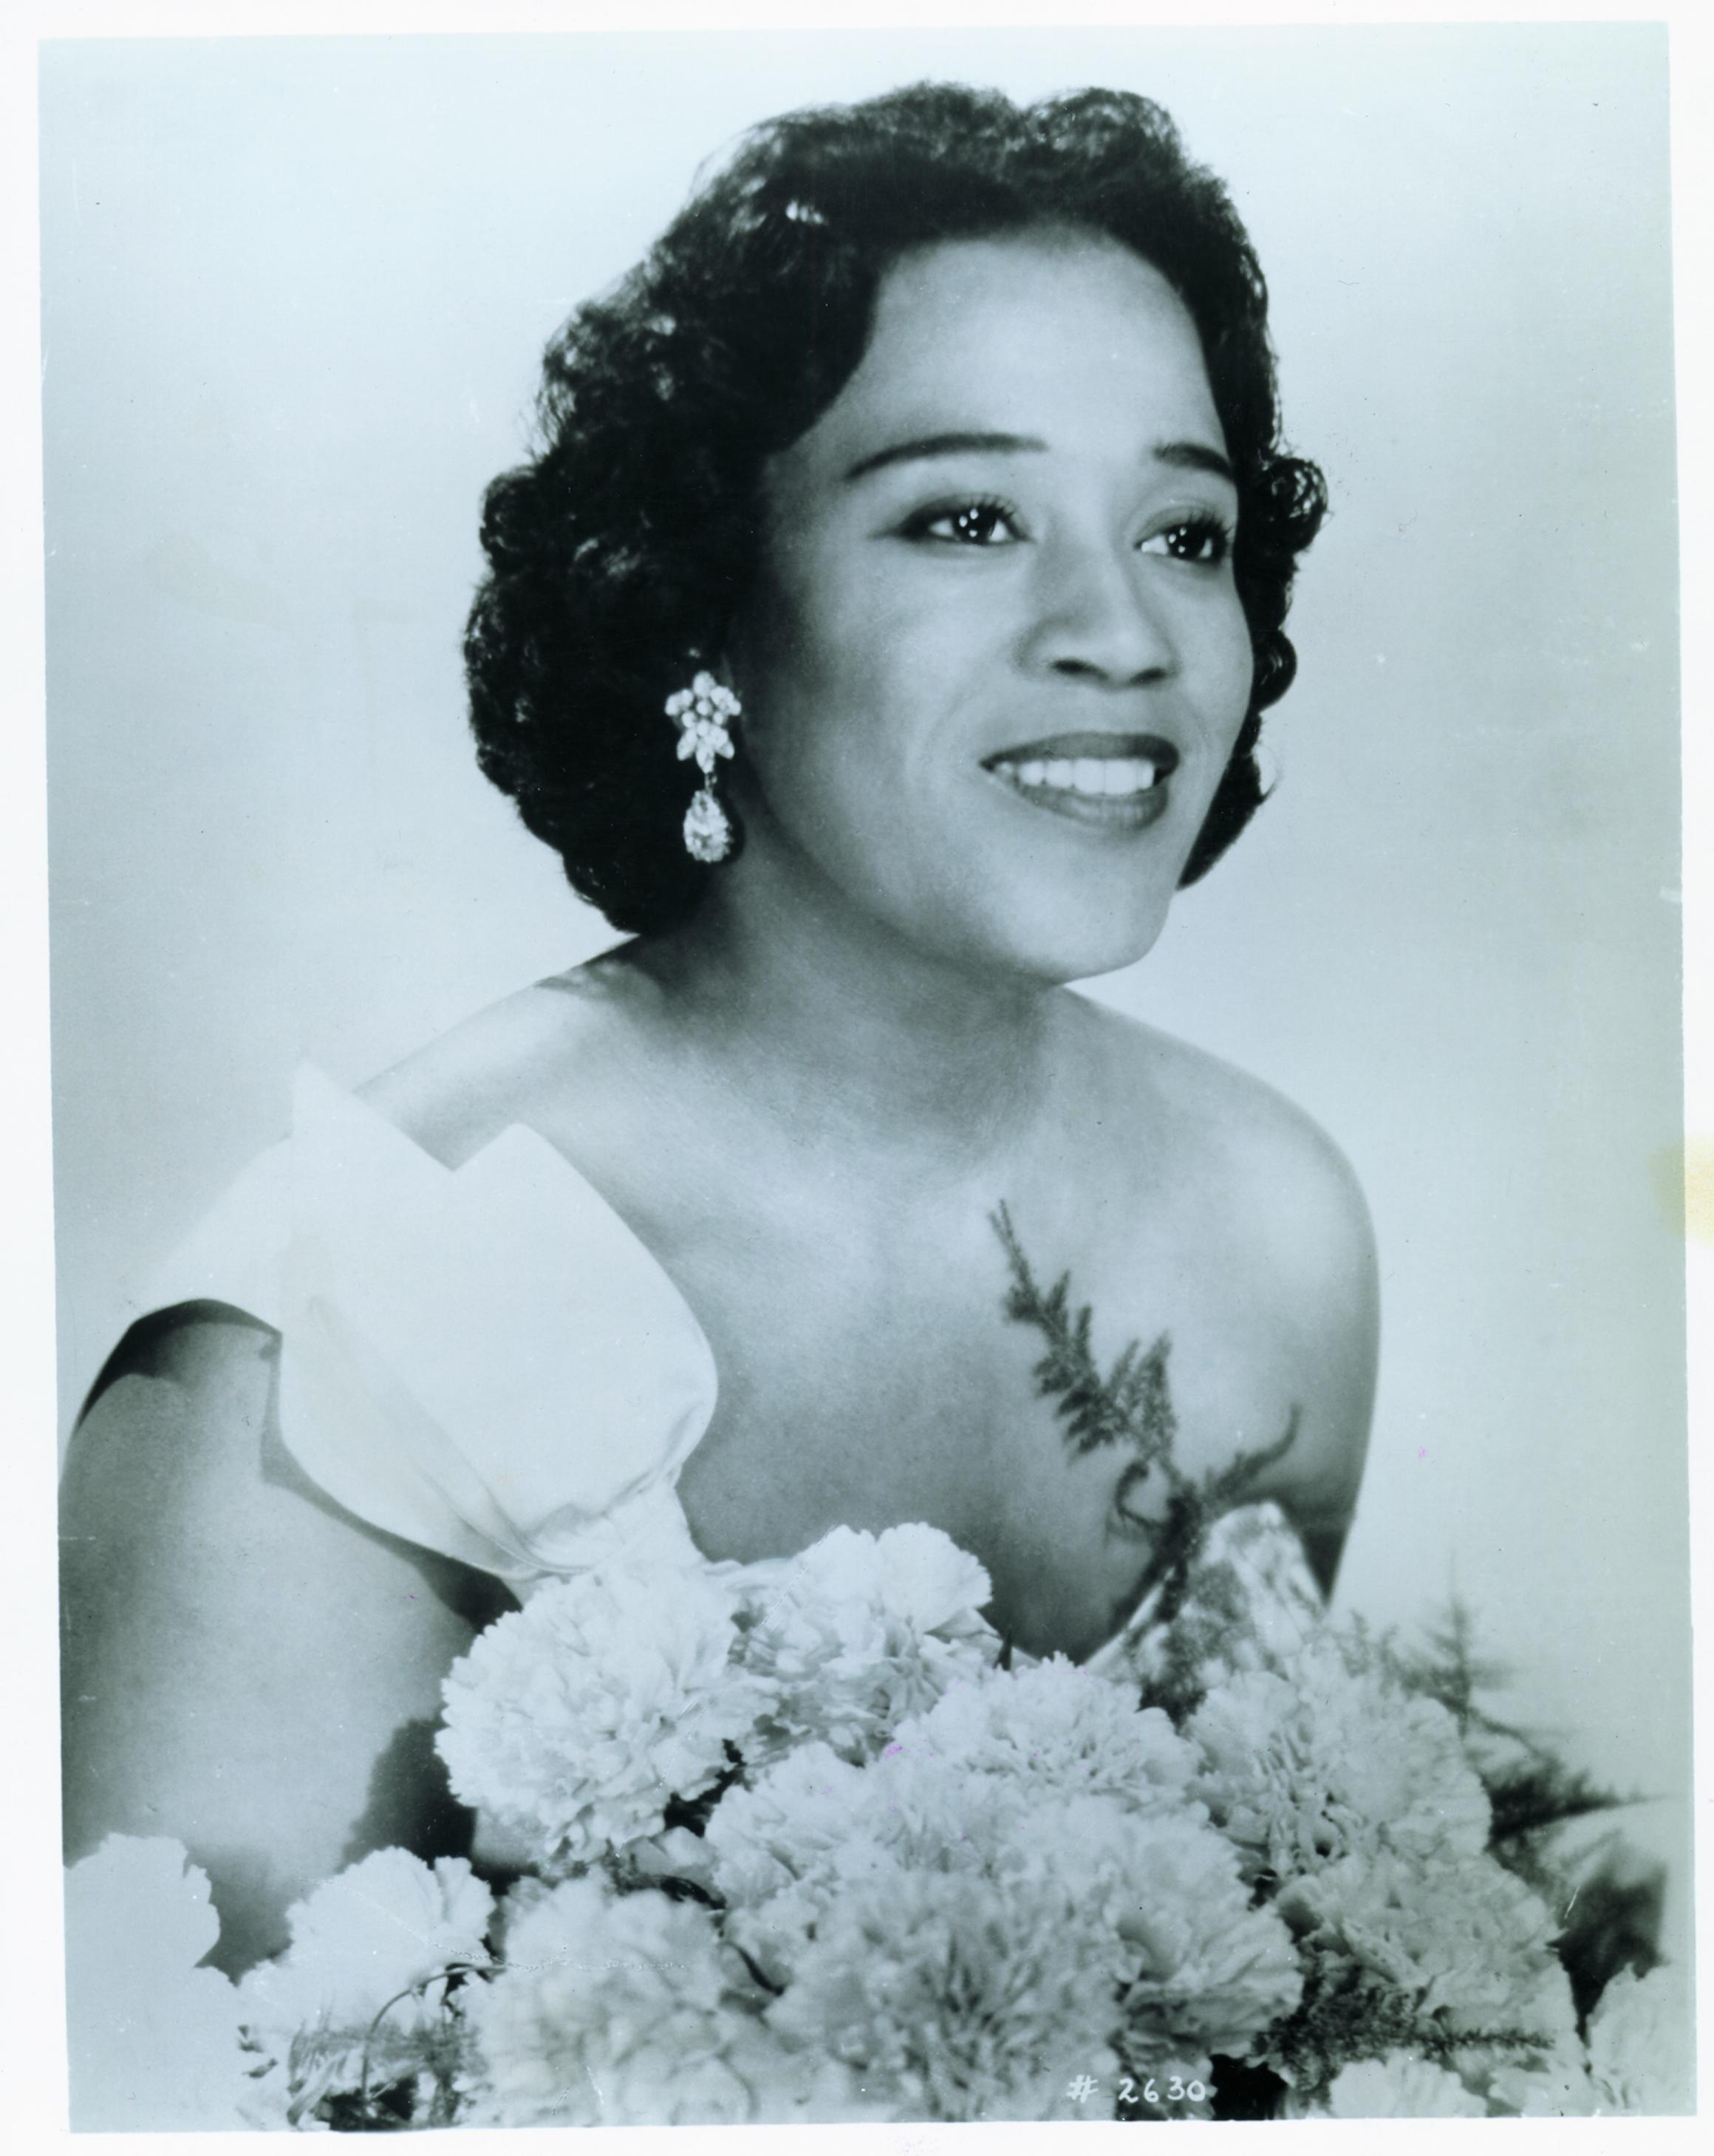 Photograph of Camilla Williams, courtesy of the Virginia Historical Society.